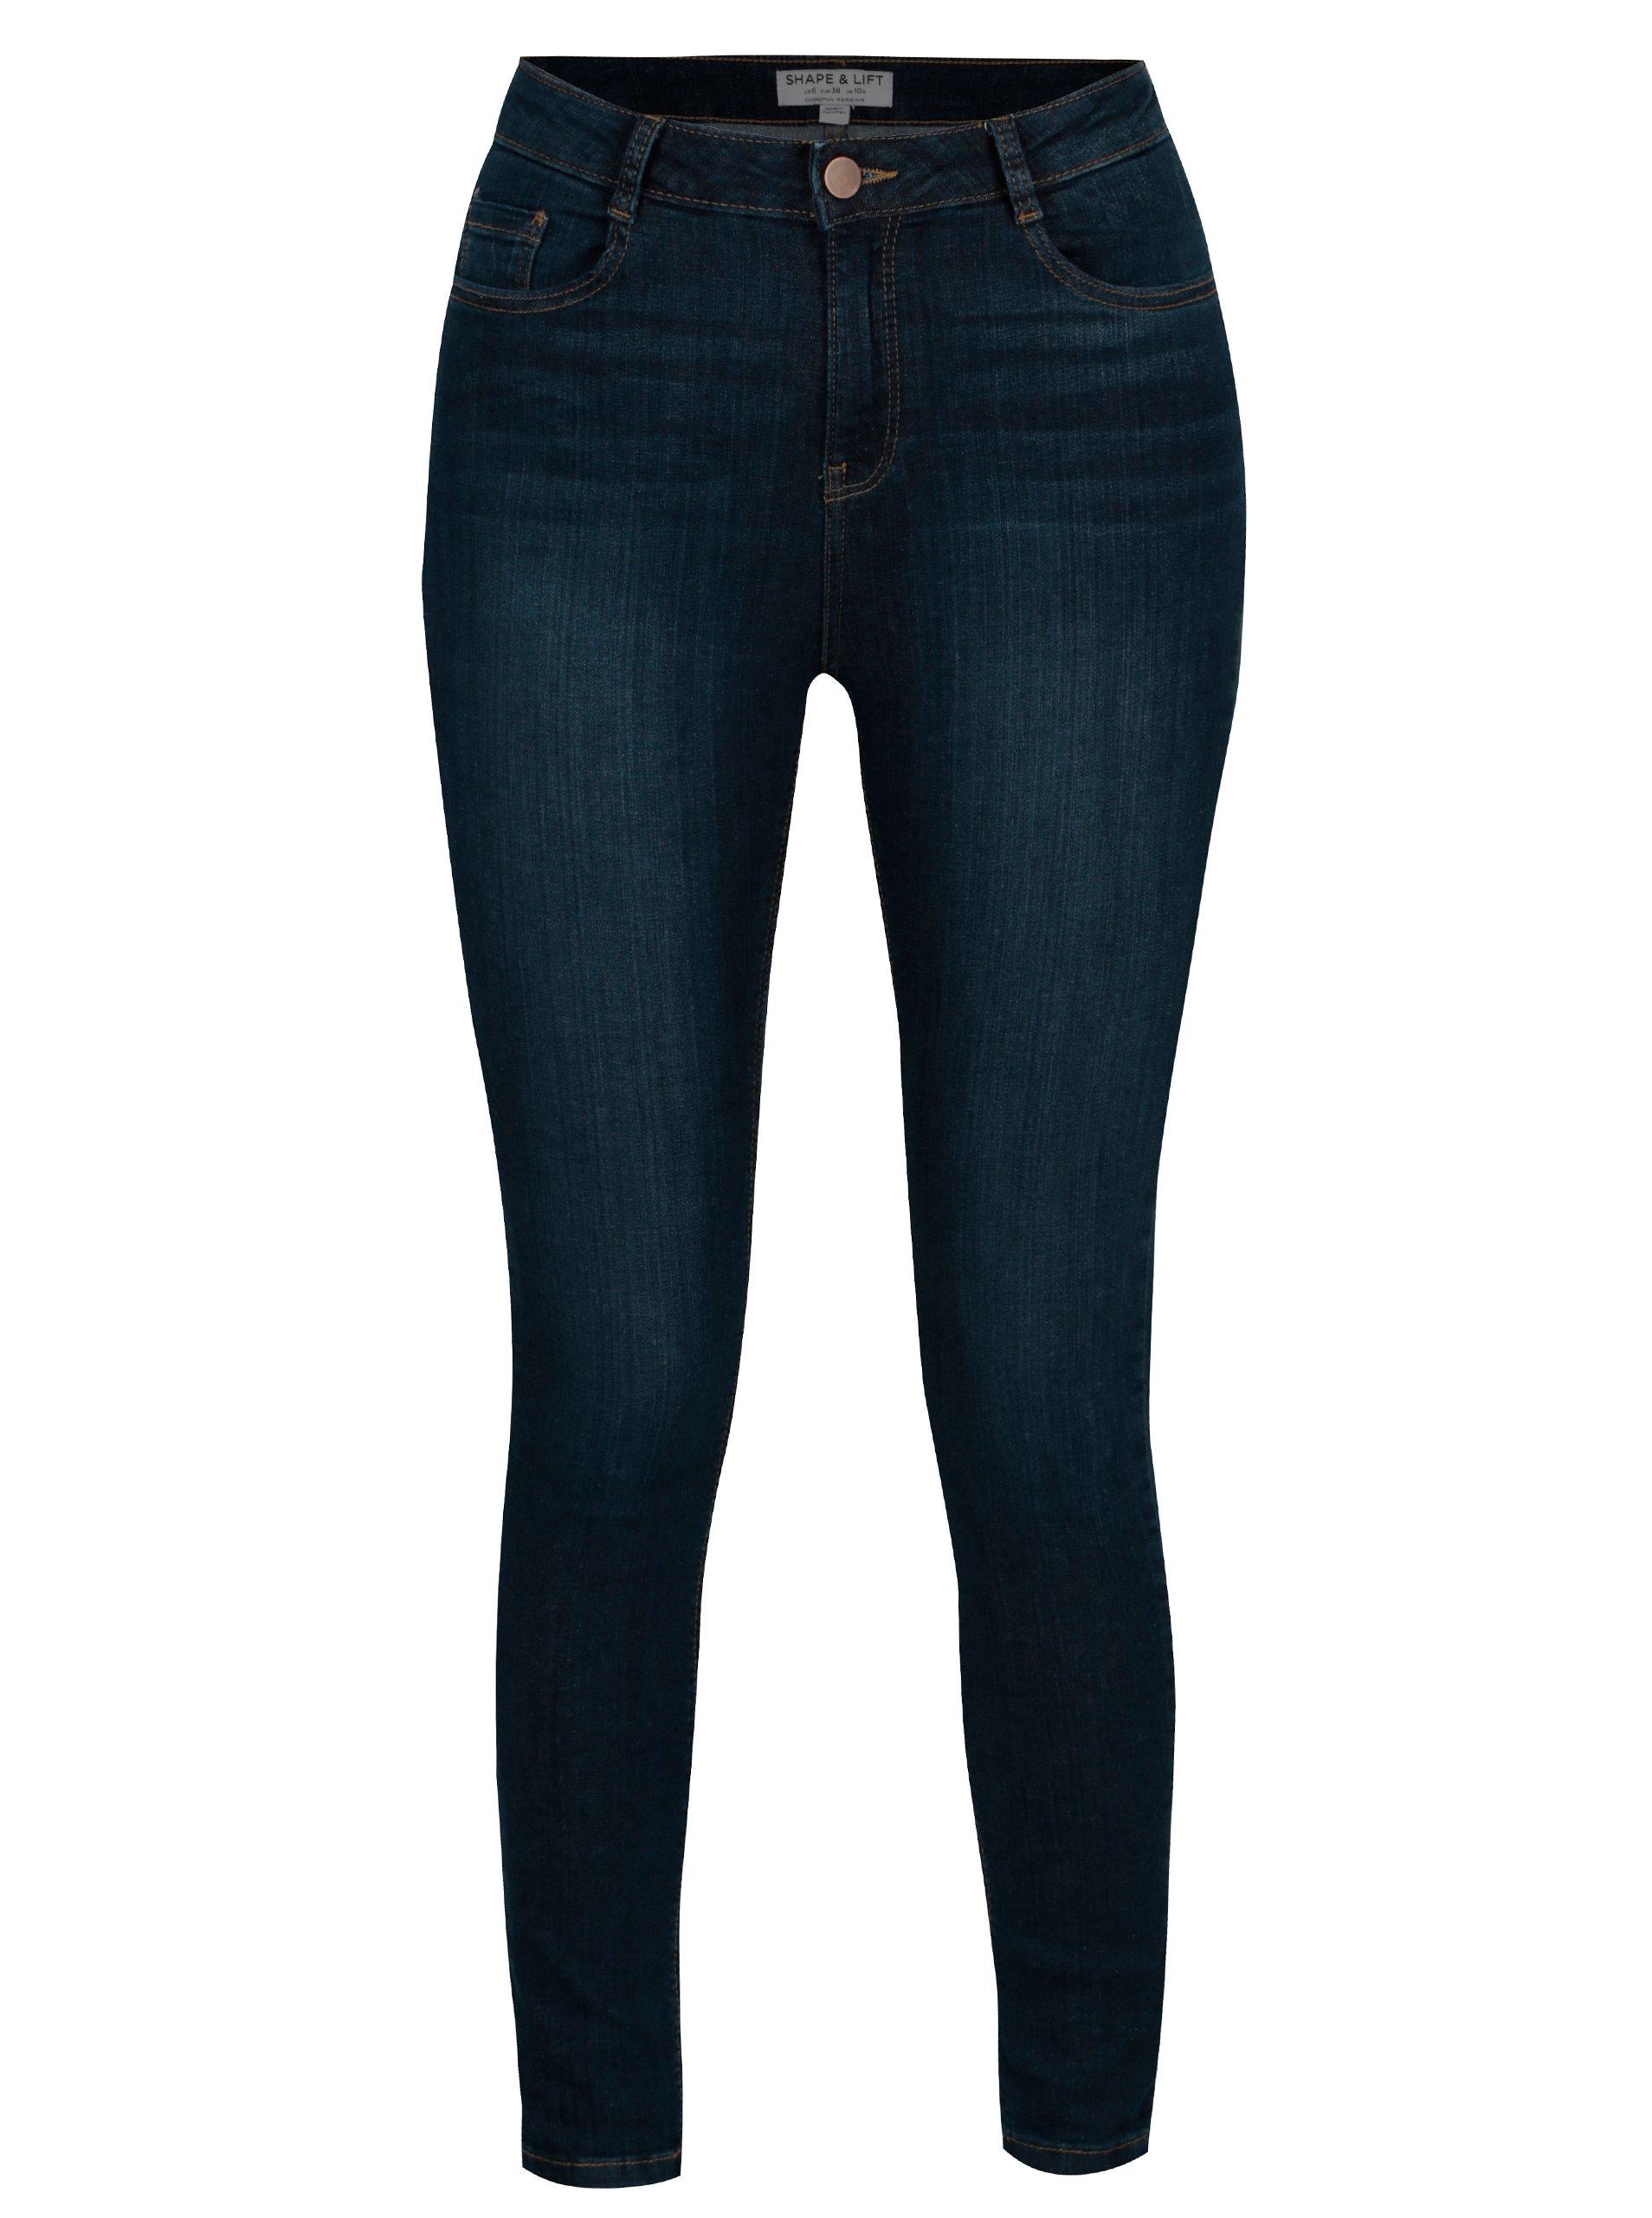 aabcc7130a9 Modré regular džíny s vysokým pasem Dorothy Perkins Shape   Lift